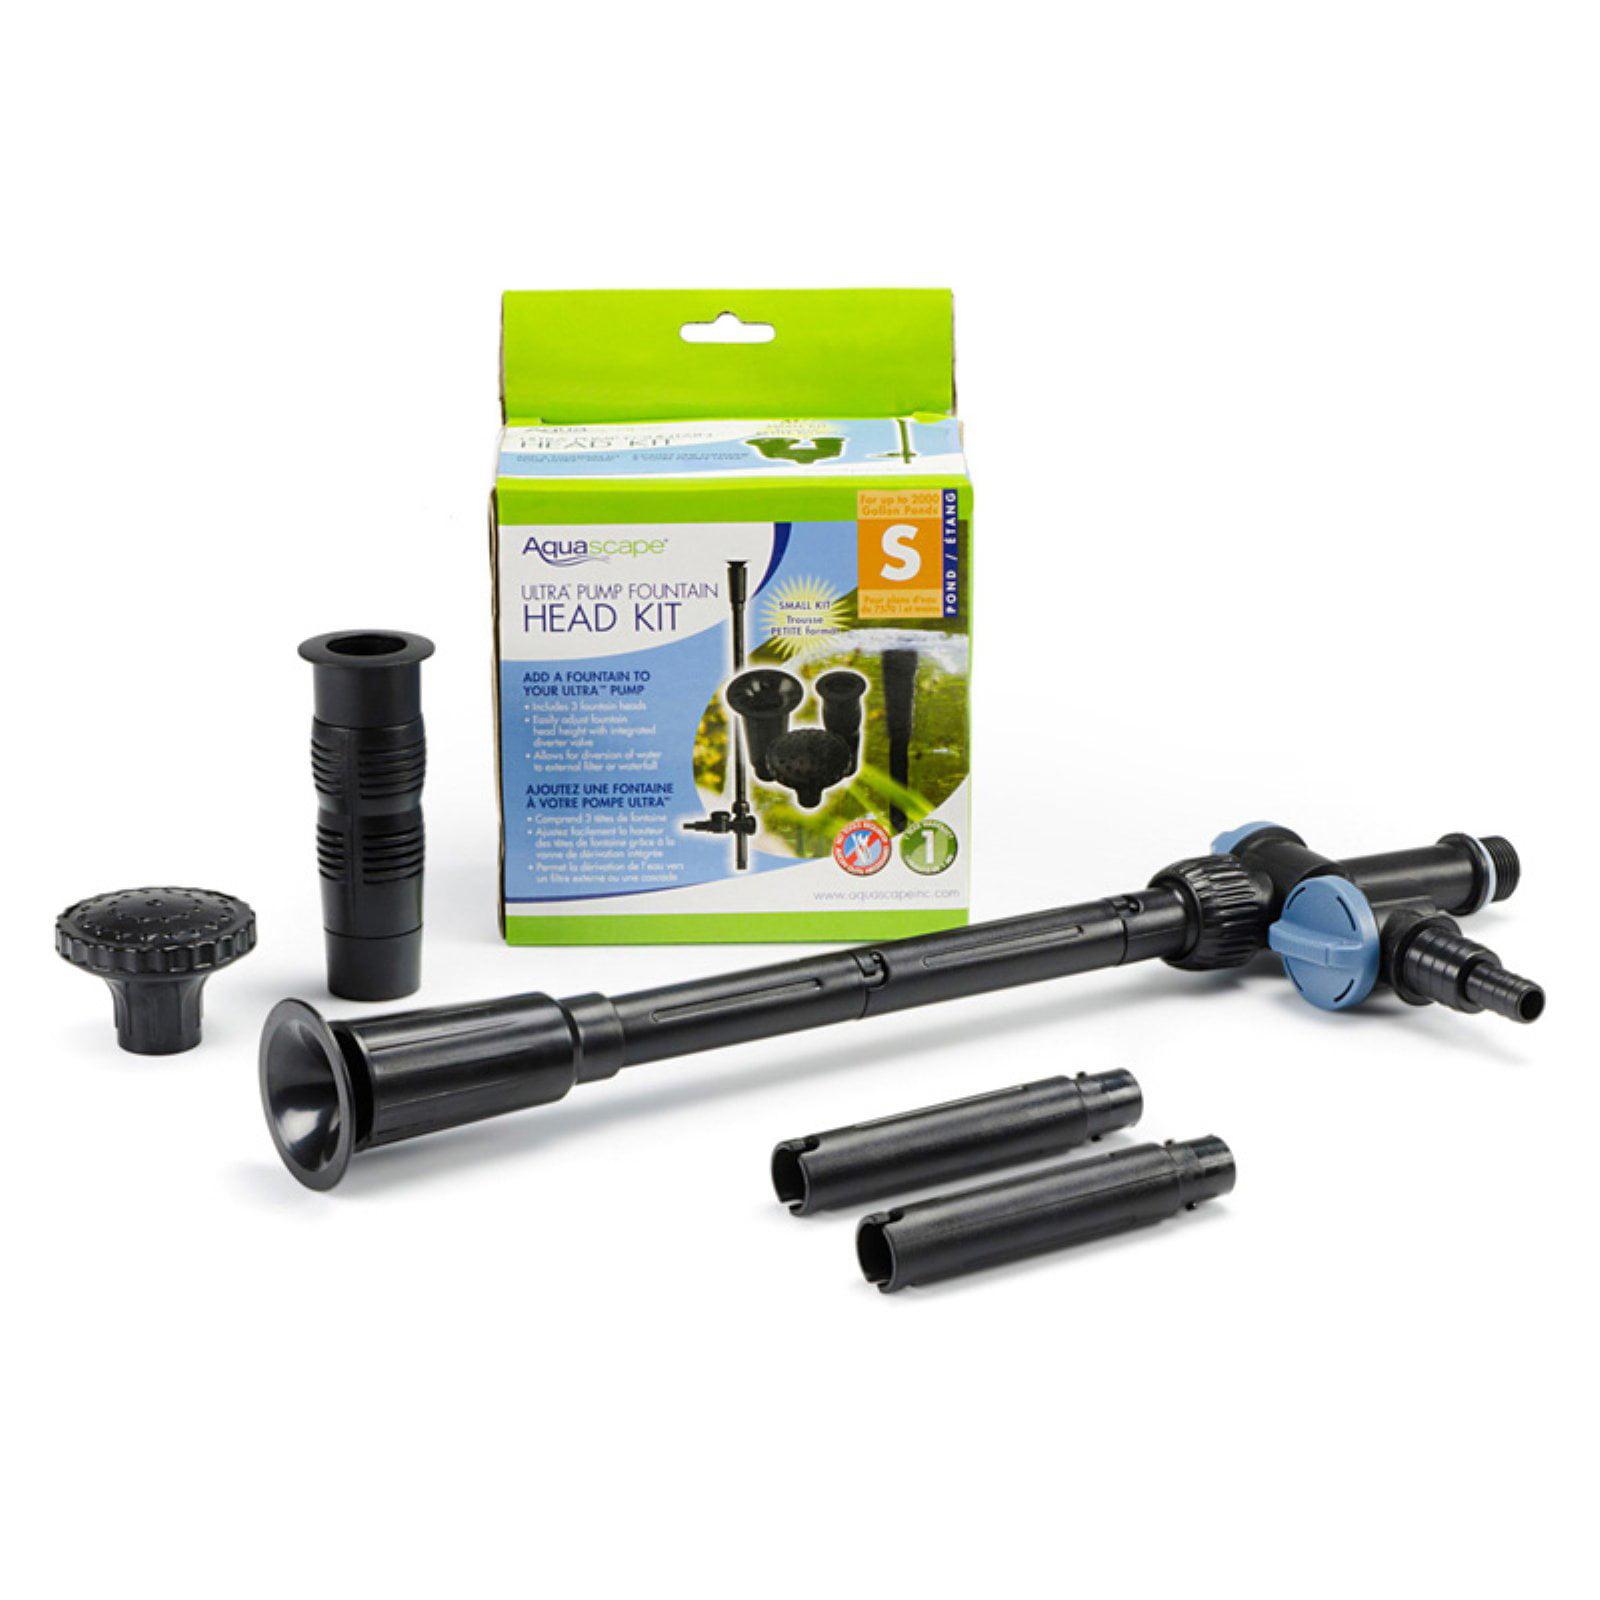 Aquascape Ultra Pump Fountain Head Kit Small by BFG Supply